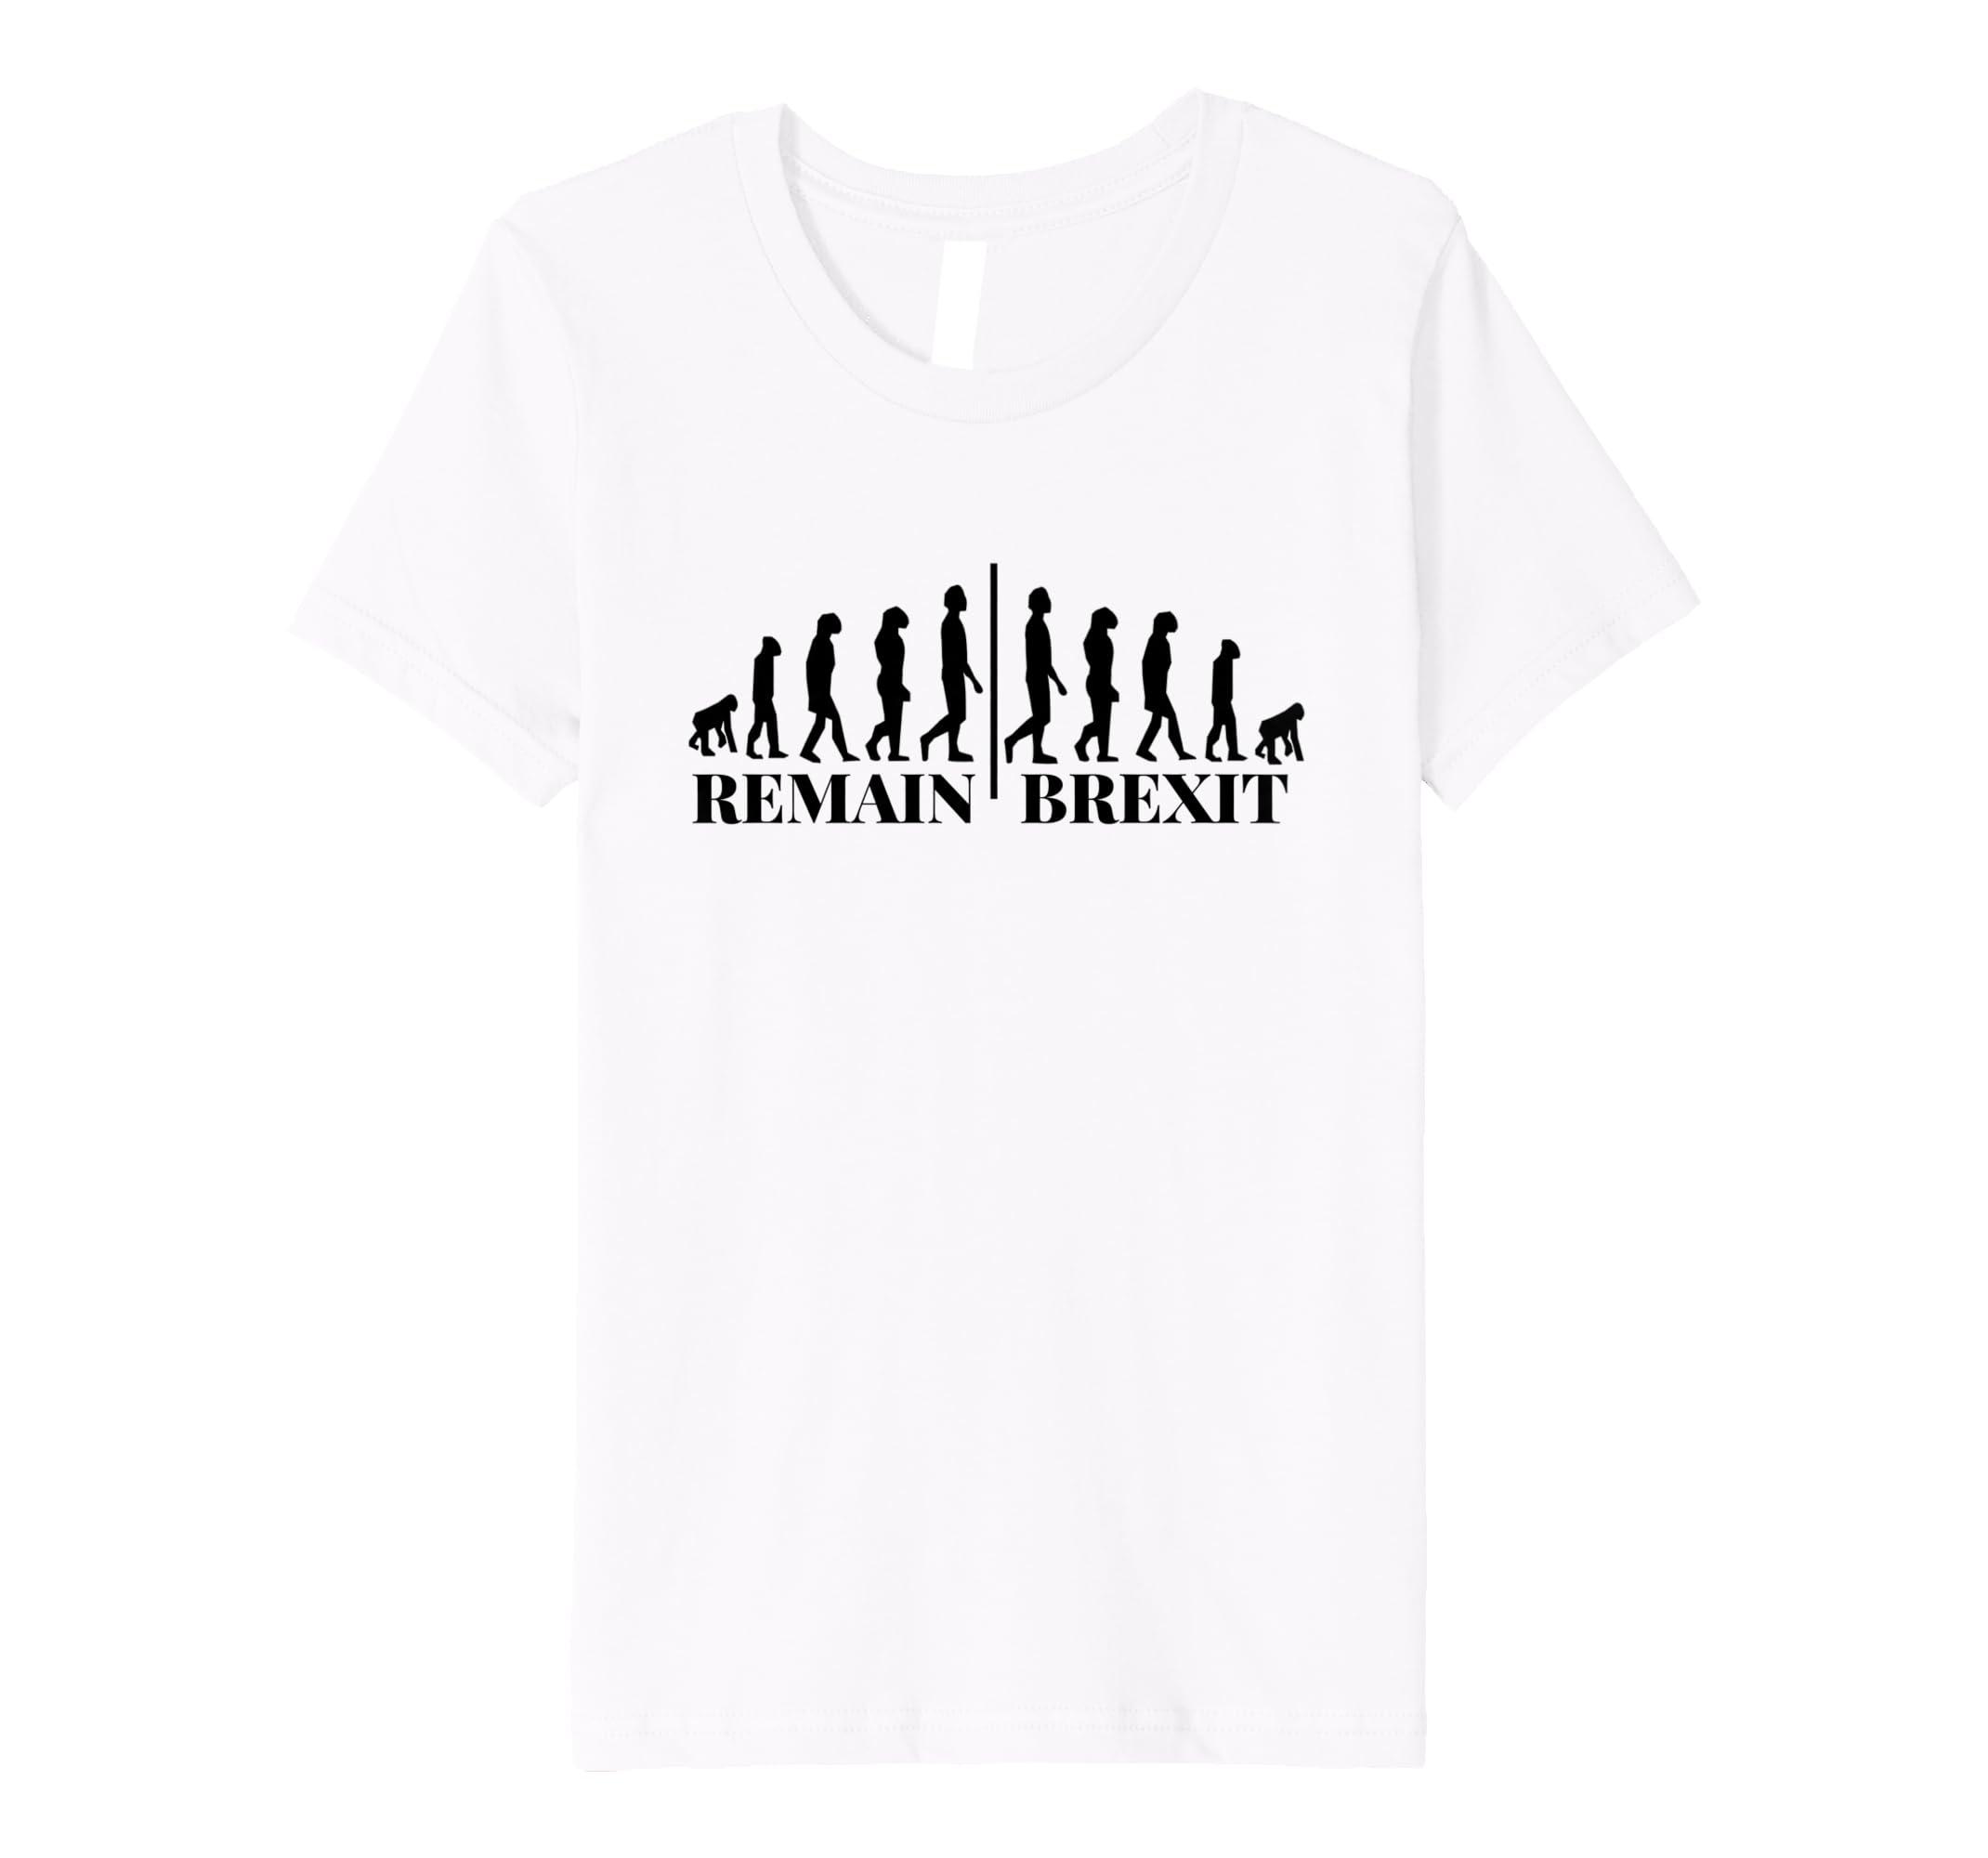 540e30e9 Brexit T Shirt Remainer Anti Brexiteer Pro EU Top: Amazon.co.uk: Clothing